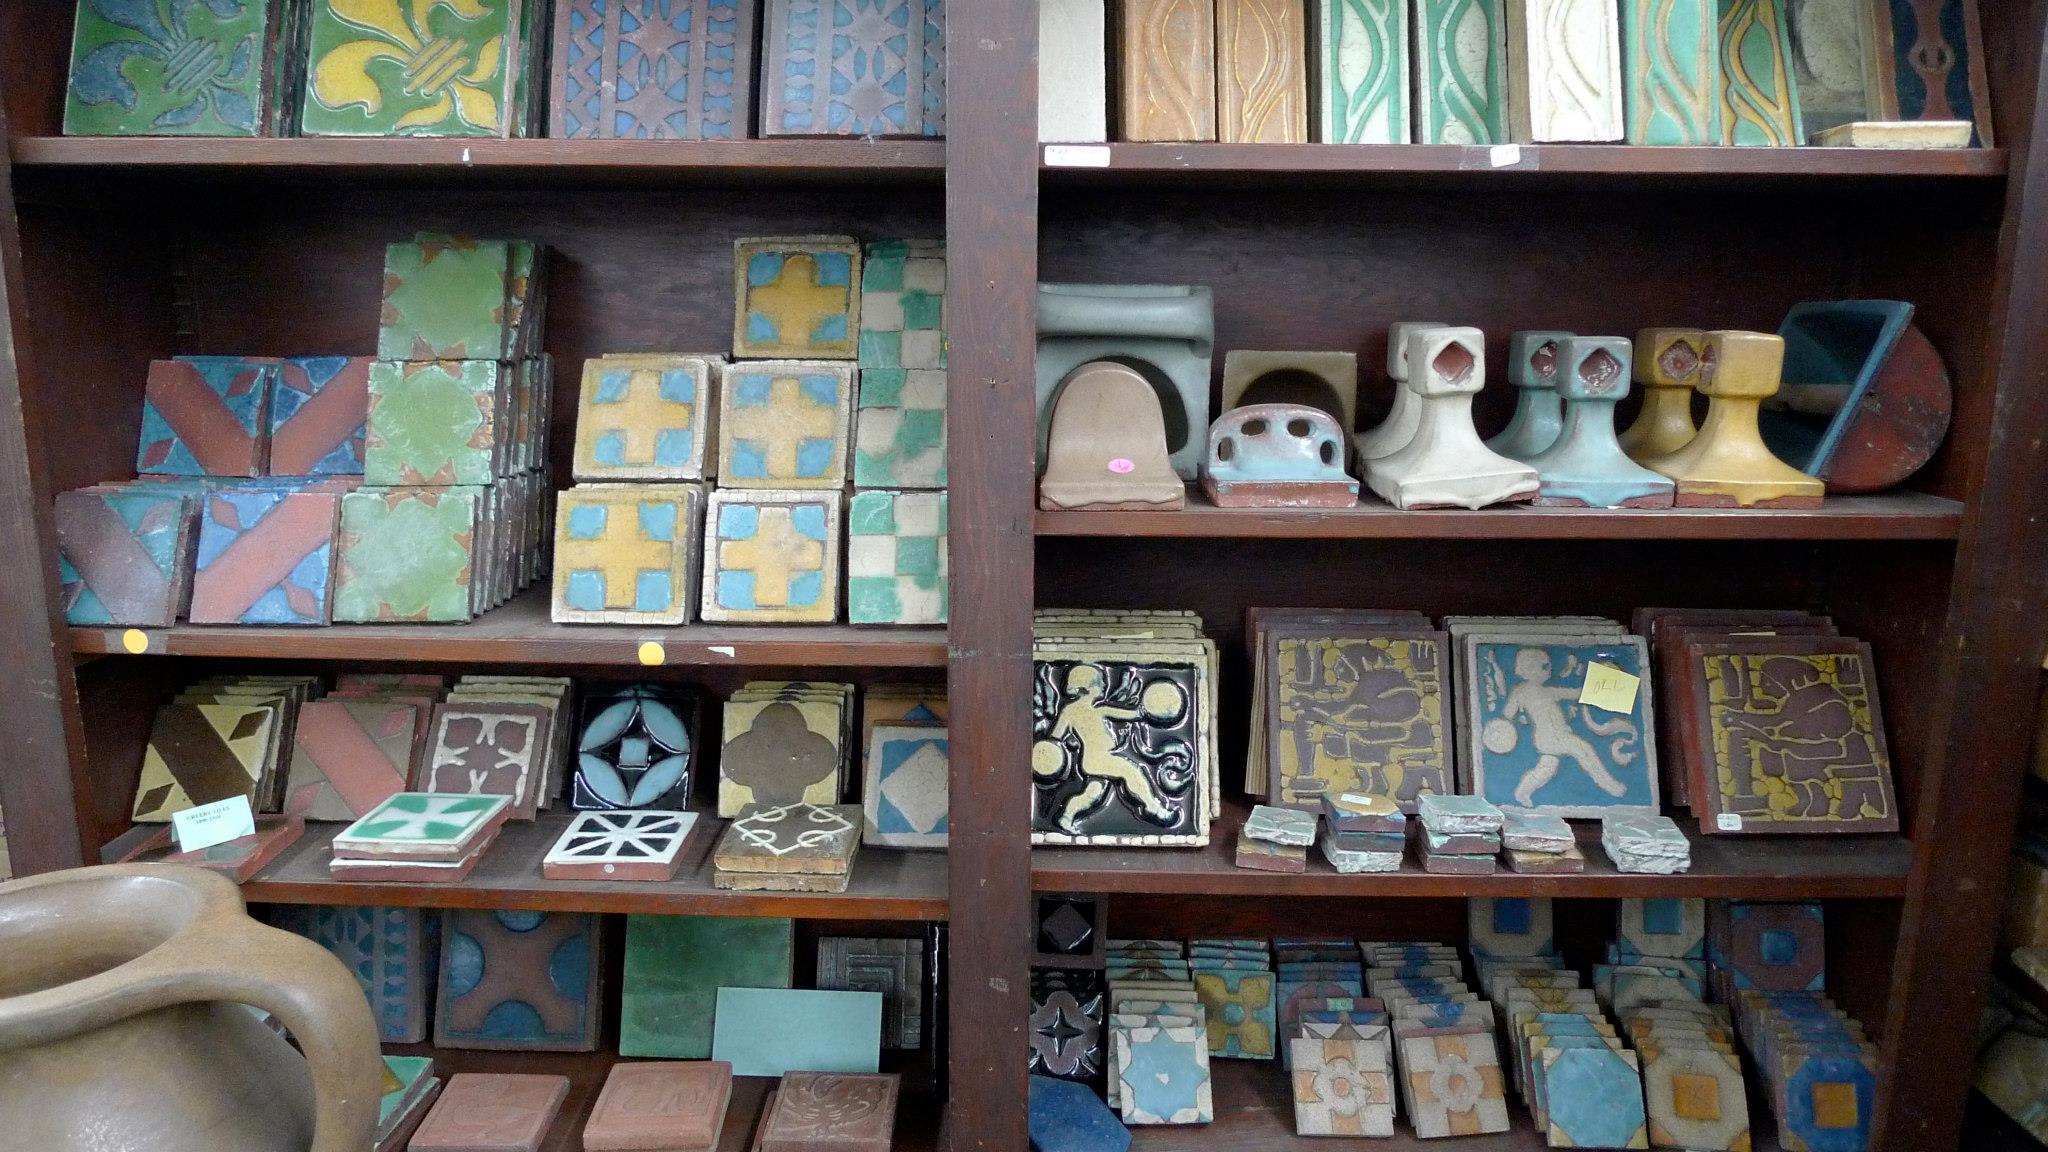 Wells Tiles & Antiques